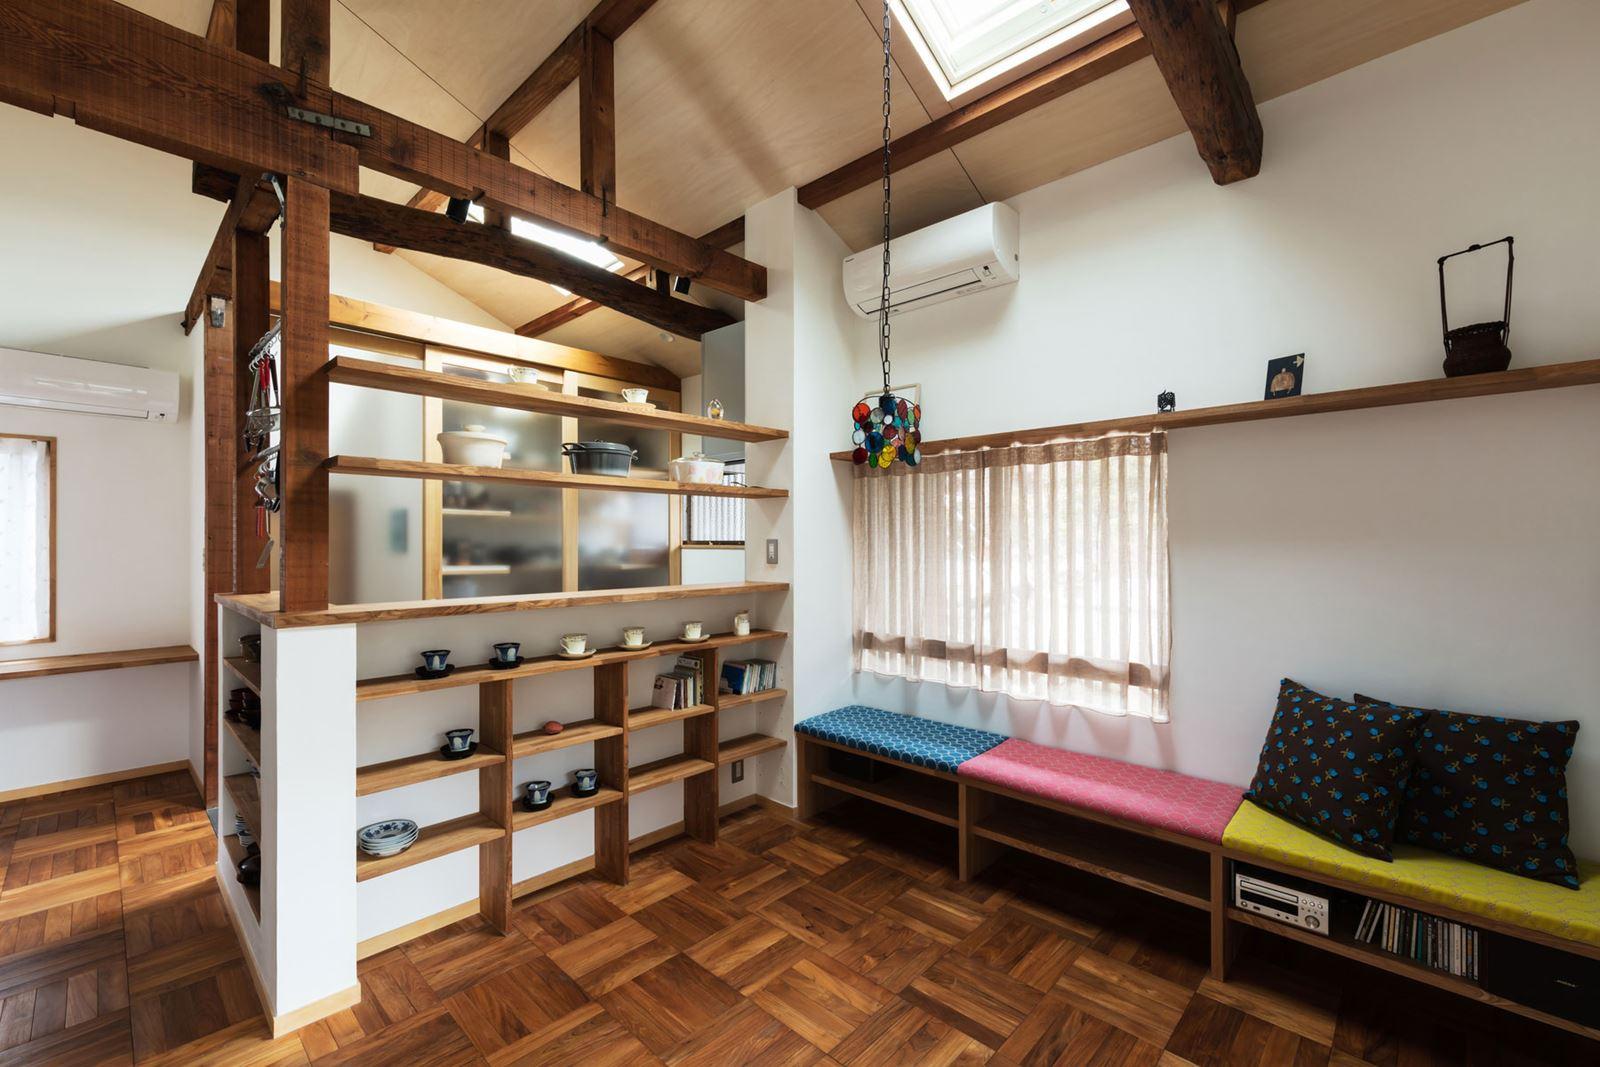 c5d03ee85750 Una casa giapponese immersa nella luce - Mansarda.it